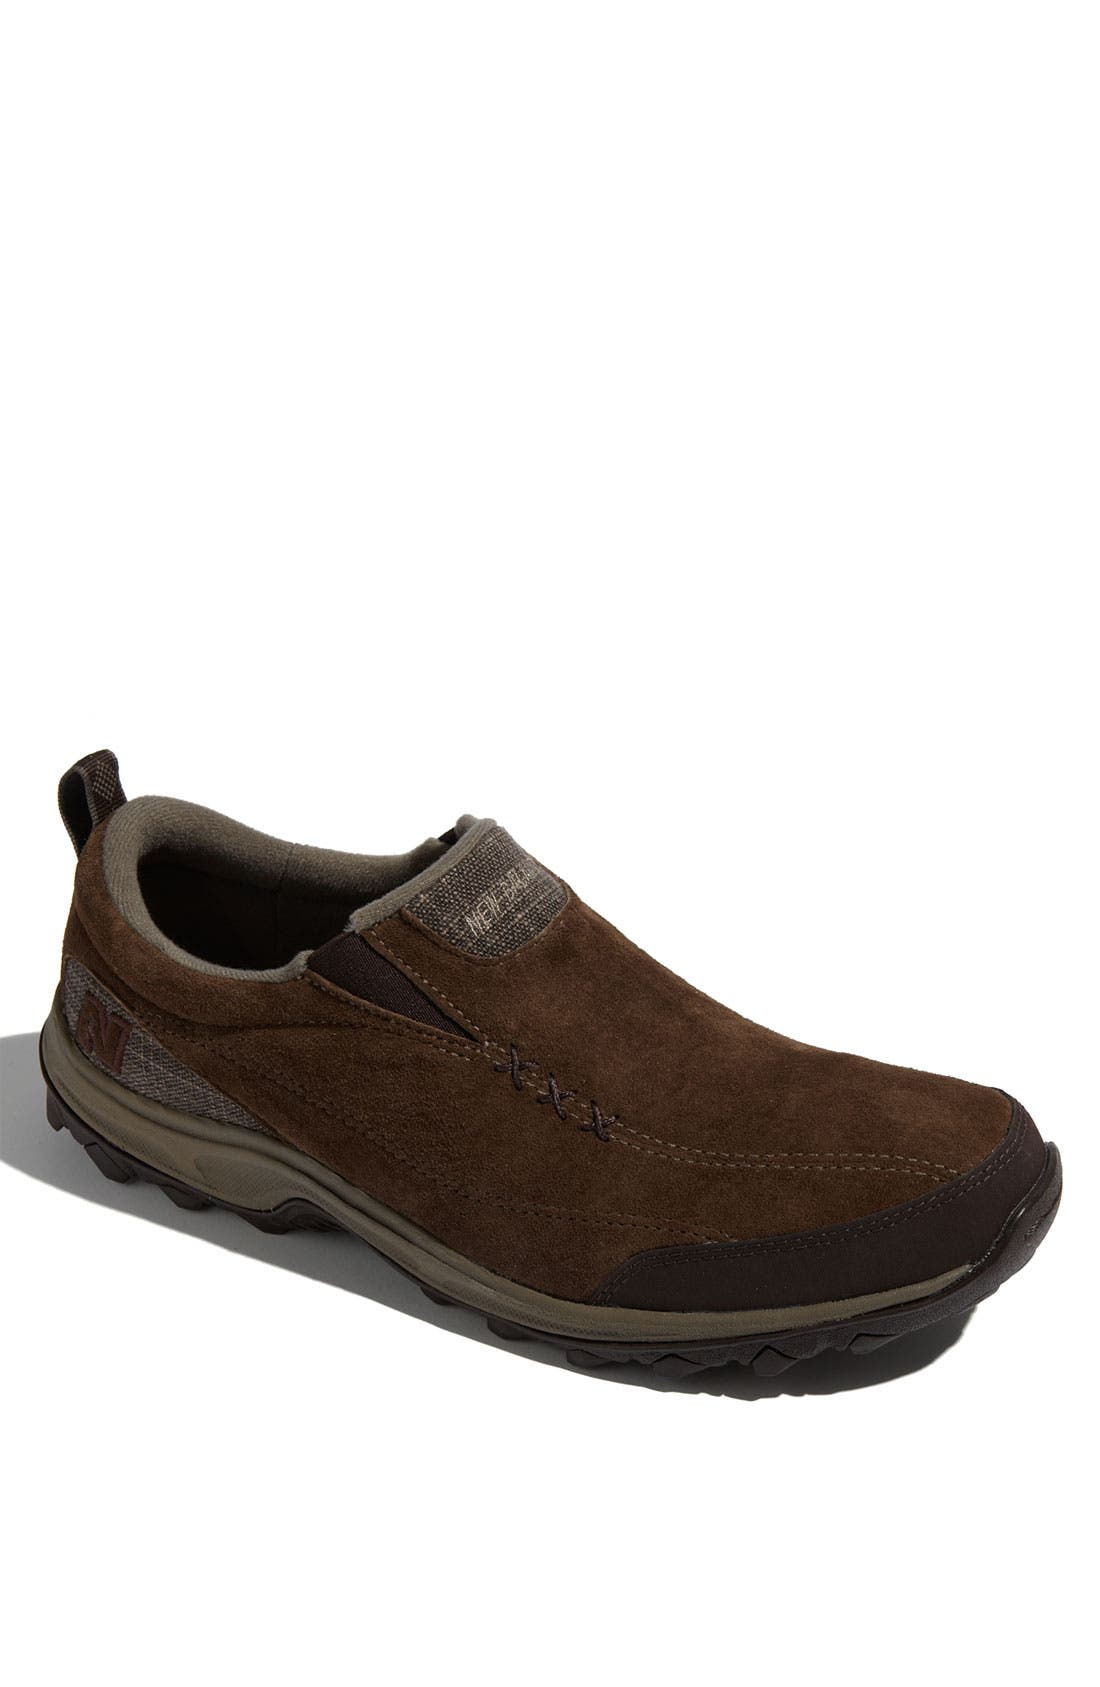 Alternate Image 1 Selected - New Balance '756' Walking Shoe (Men) (Online Only)